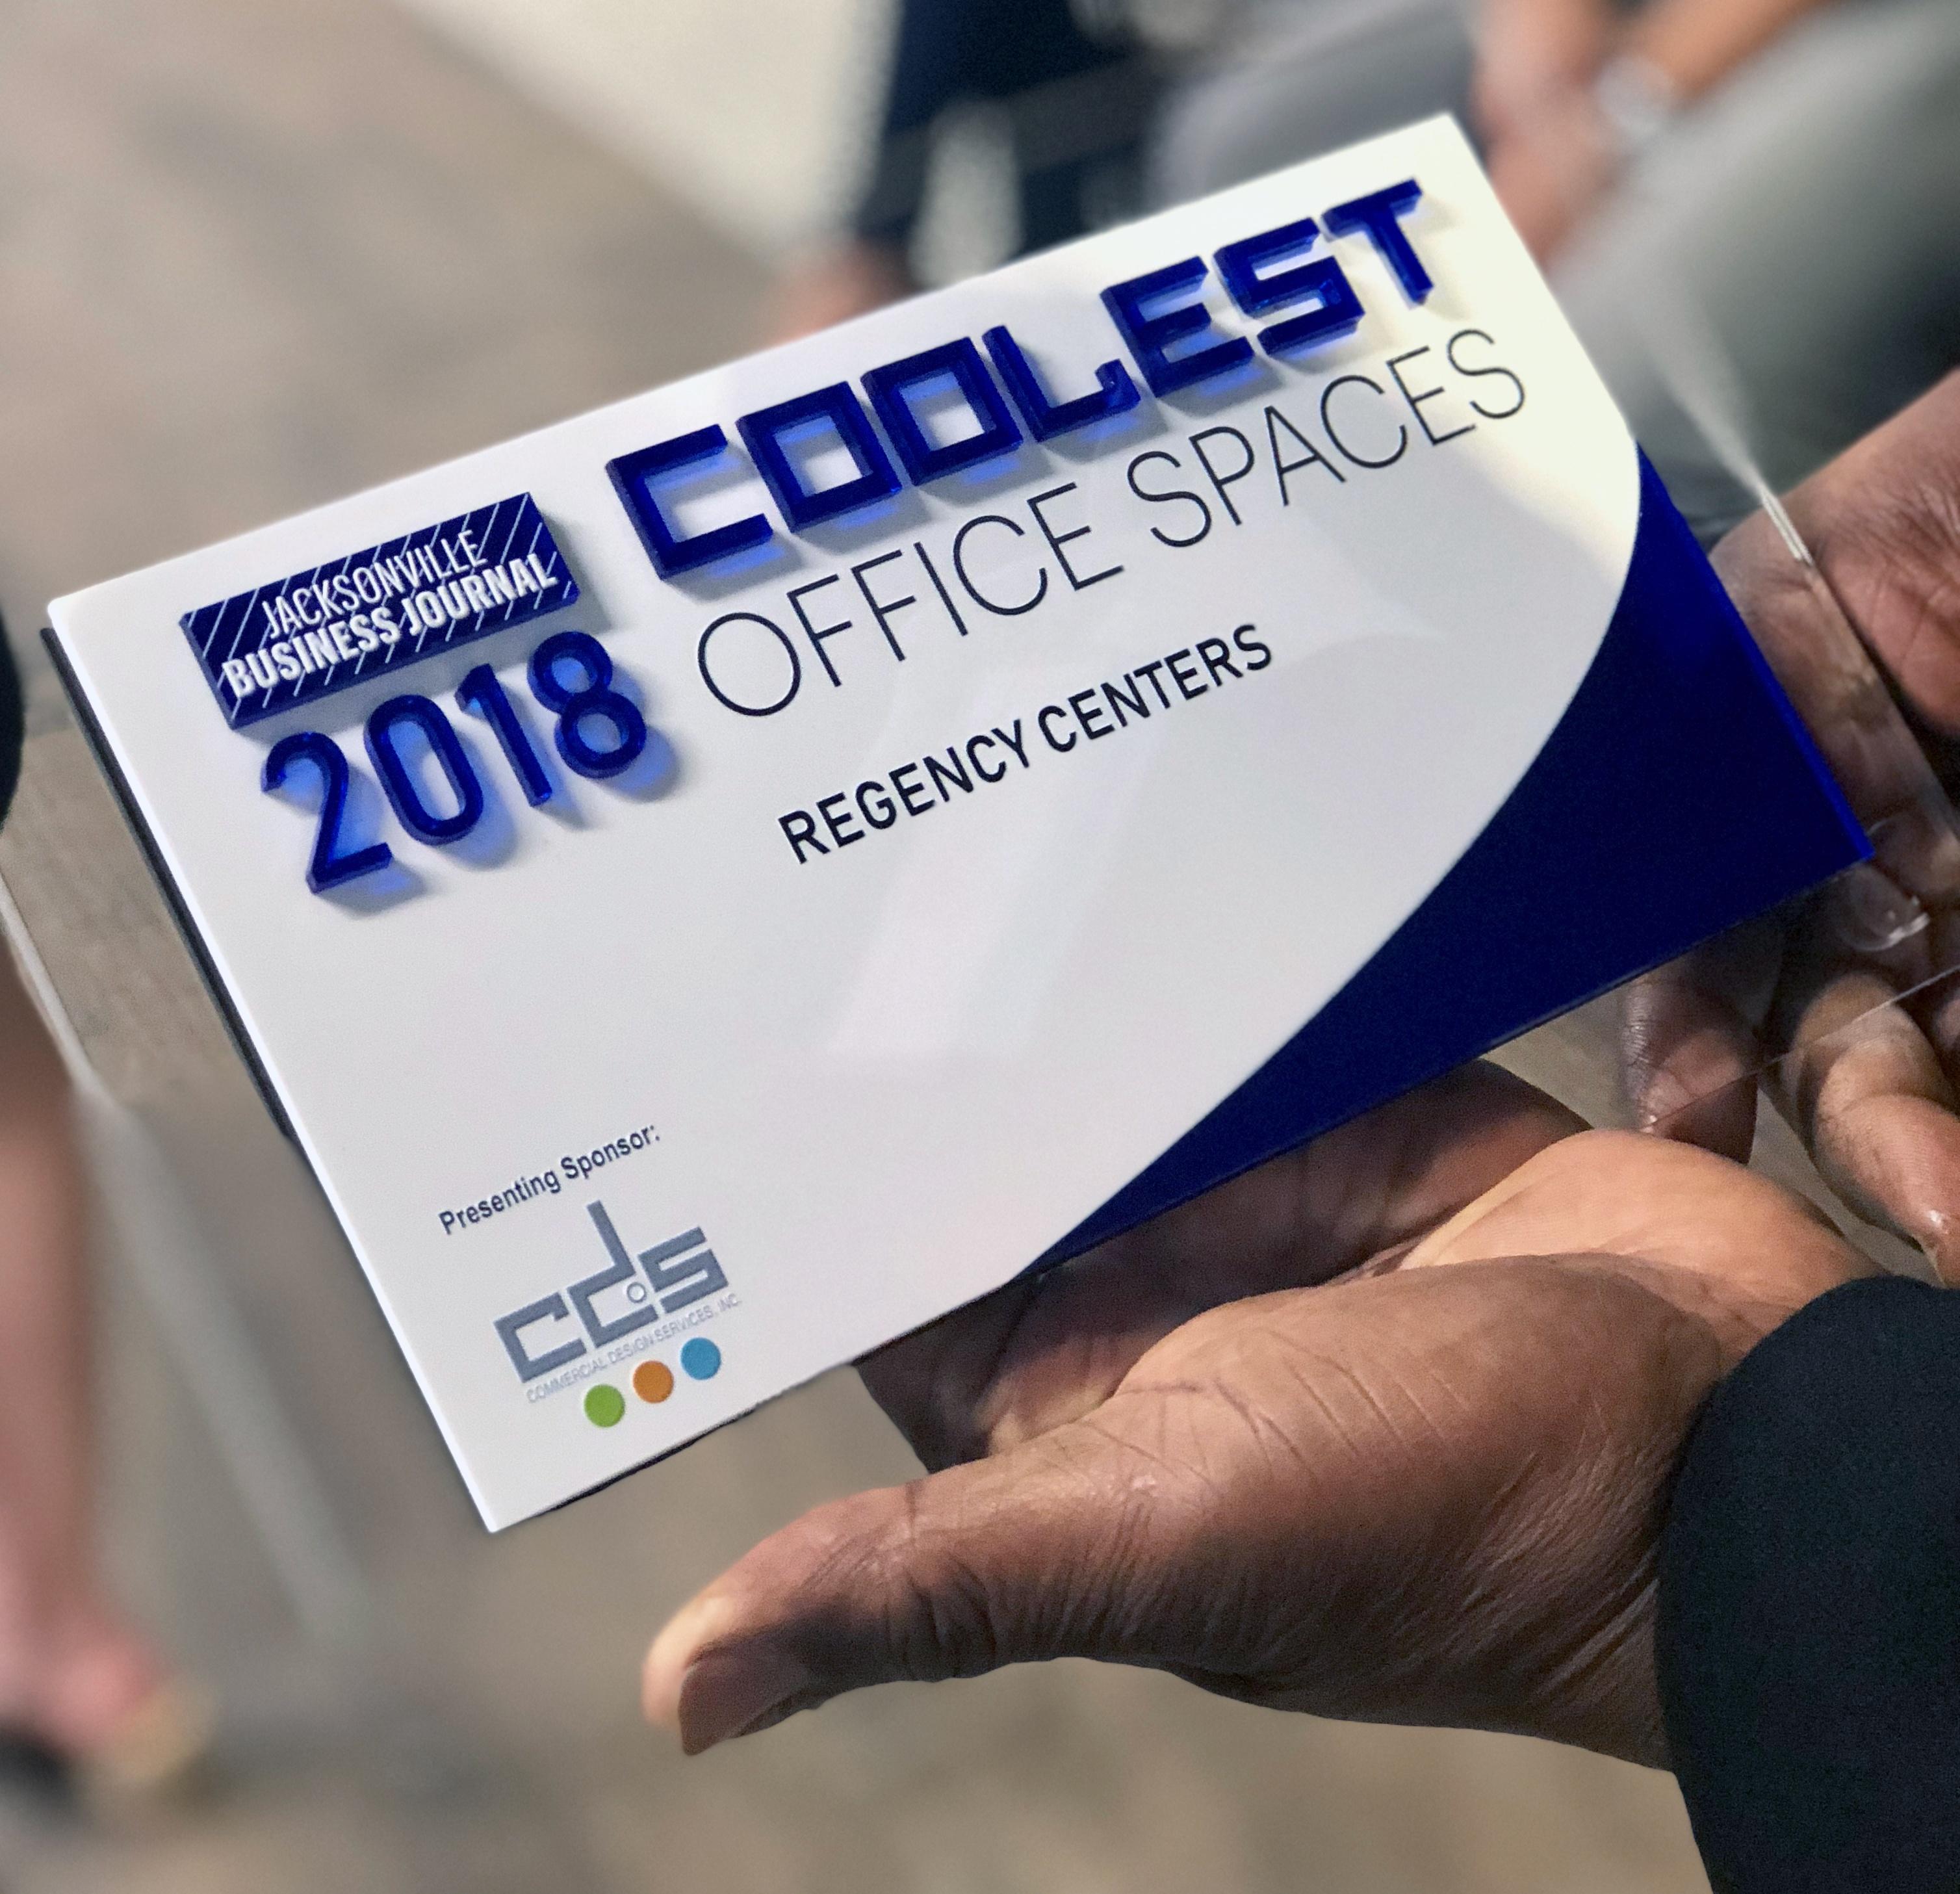 Jacksonville Business Journal Gives Regency \'Coolest Office Space\' Award